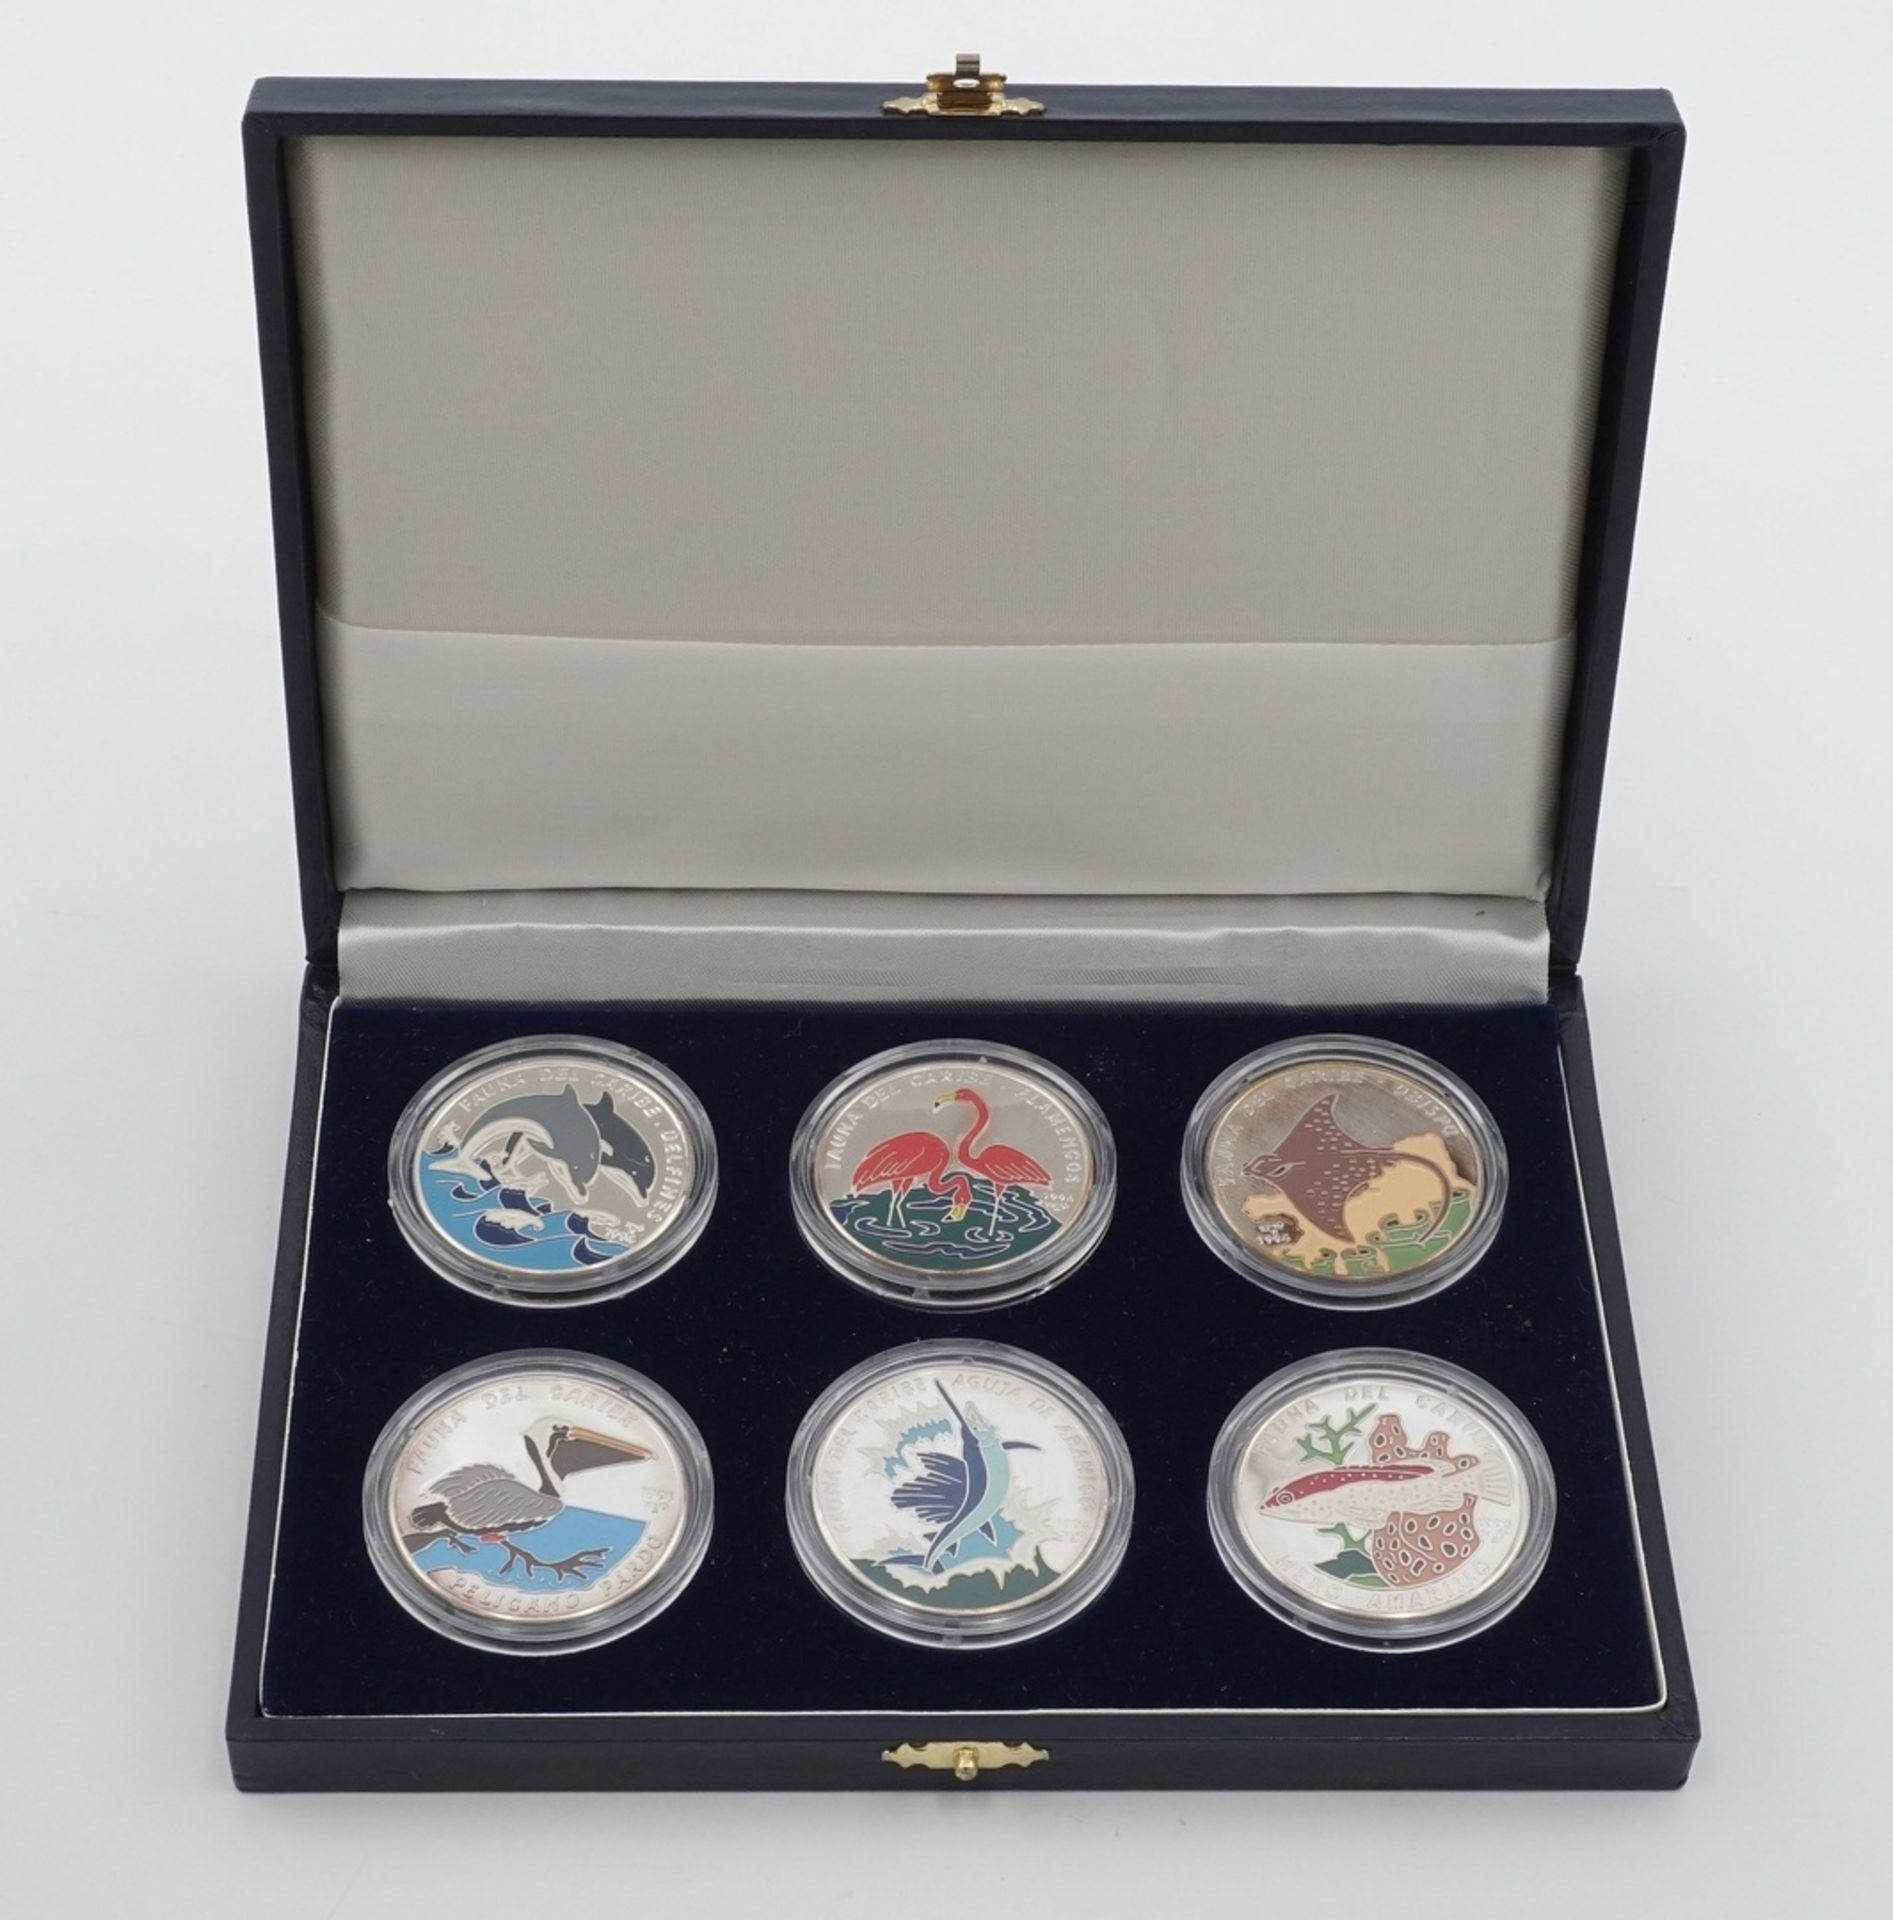 Sechs kubanische Silbermünzen